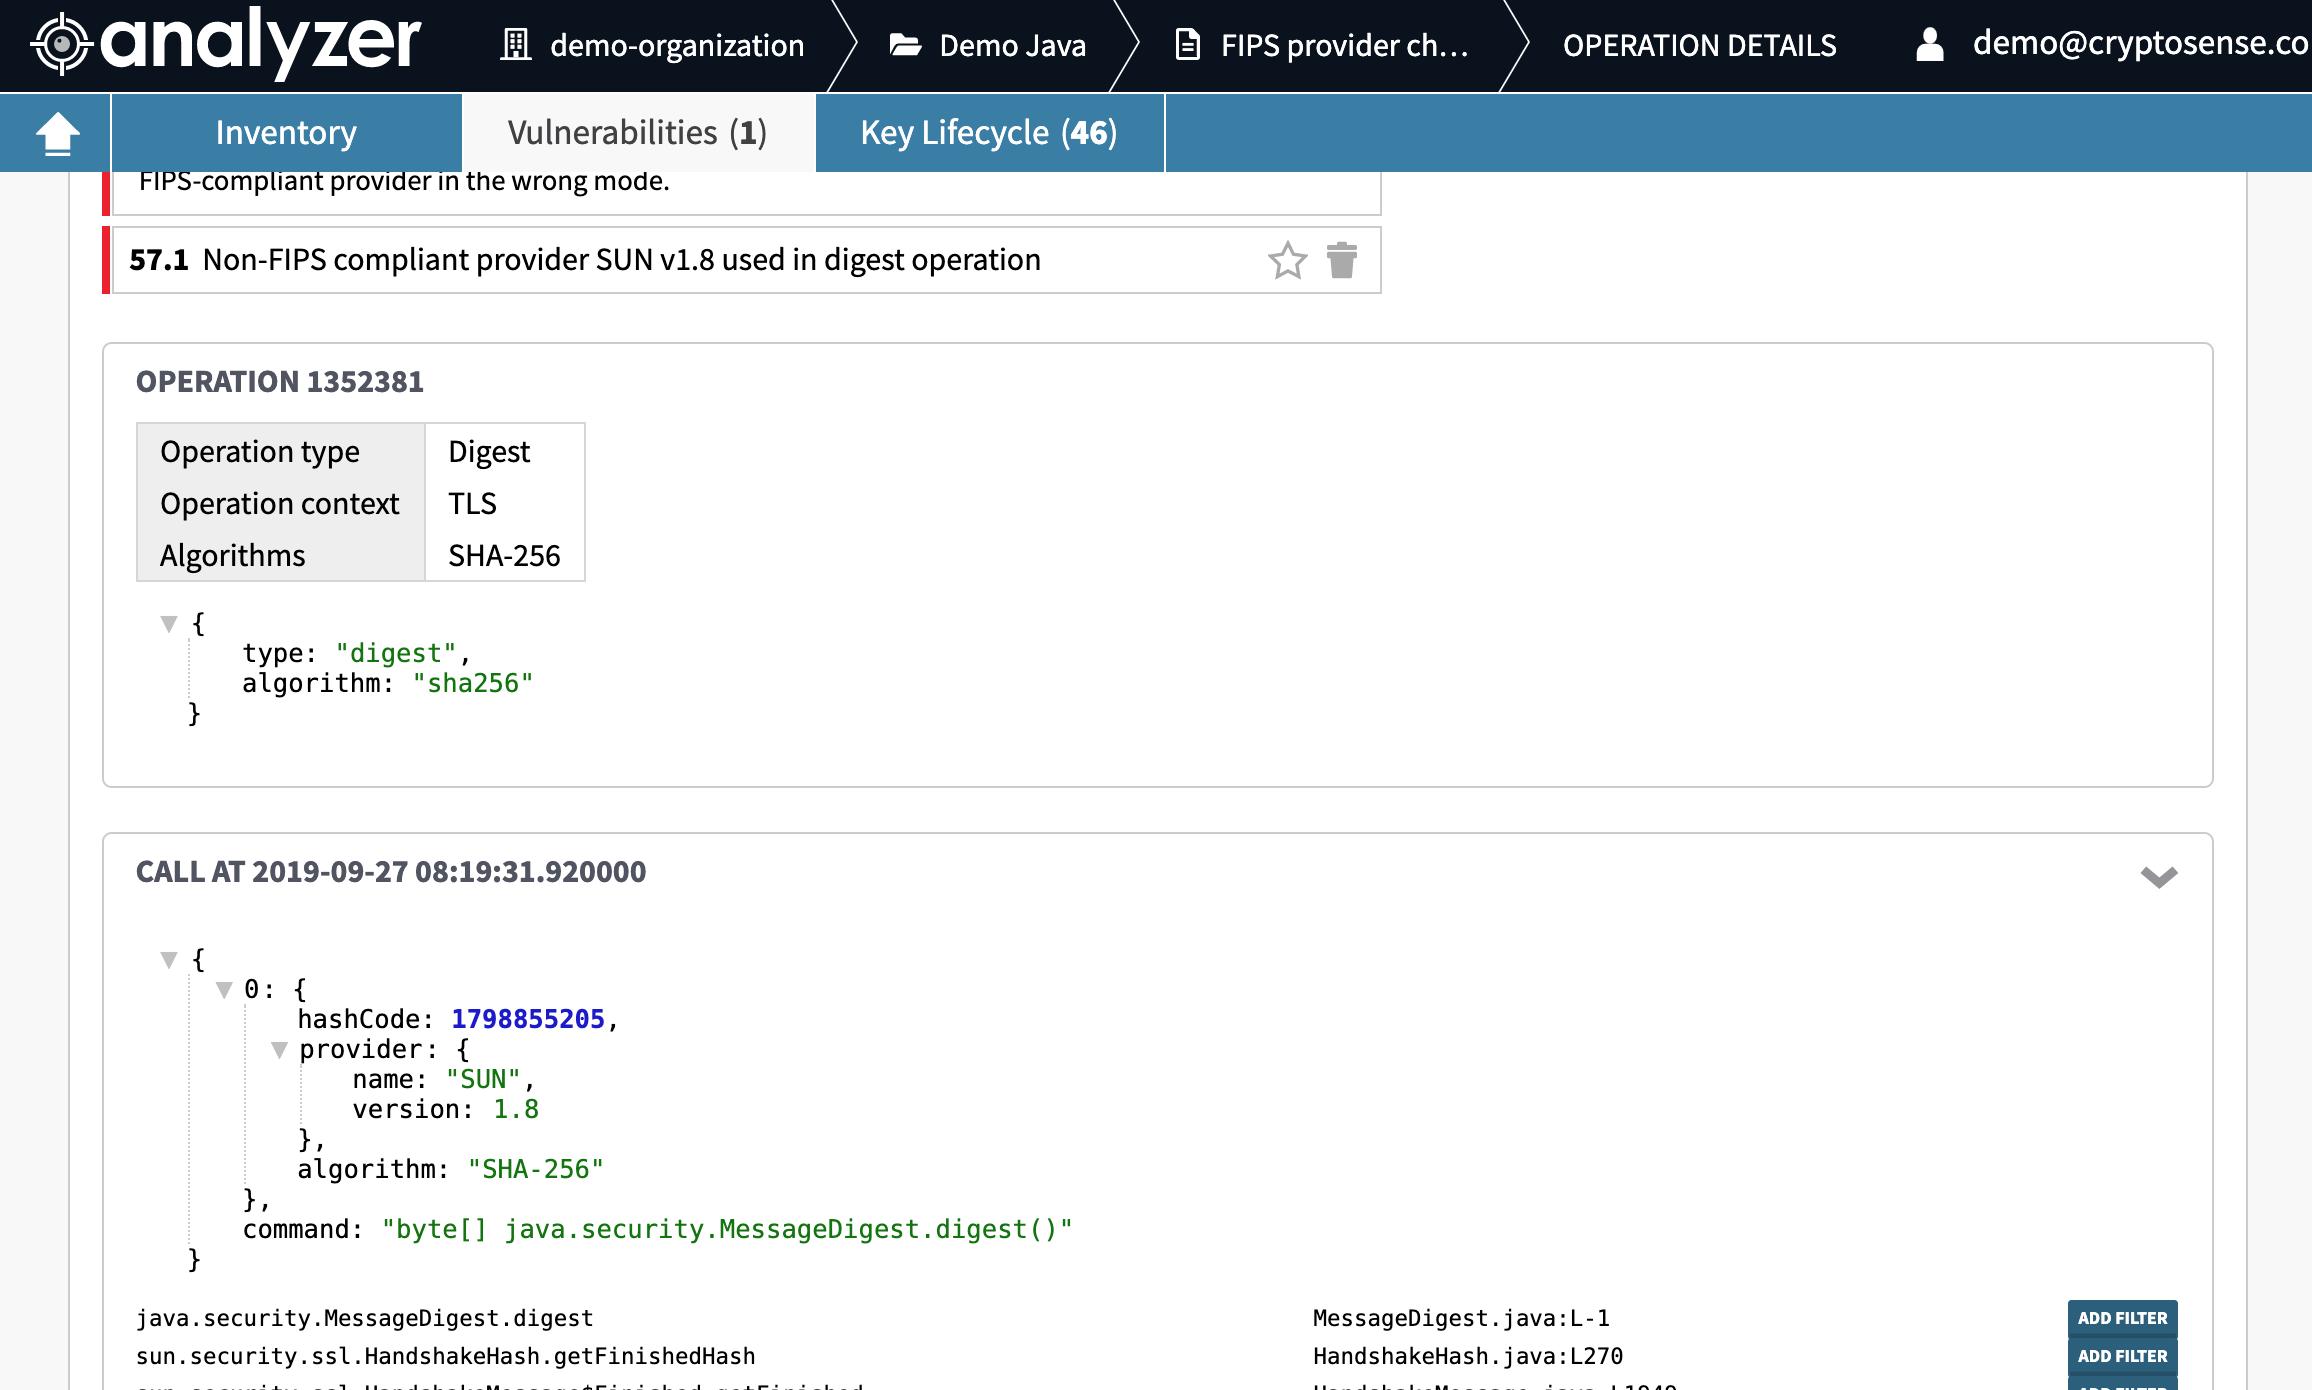 screenshot of the FIPS verifier rule in Cryptosense Analyzer